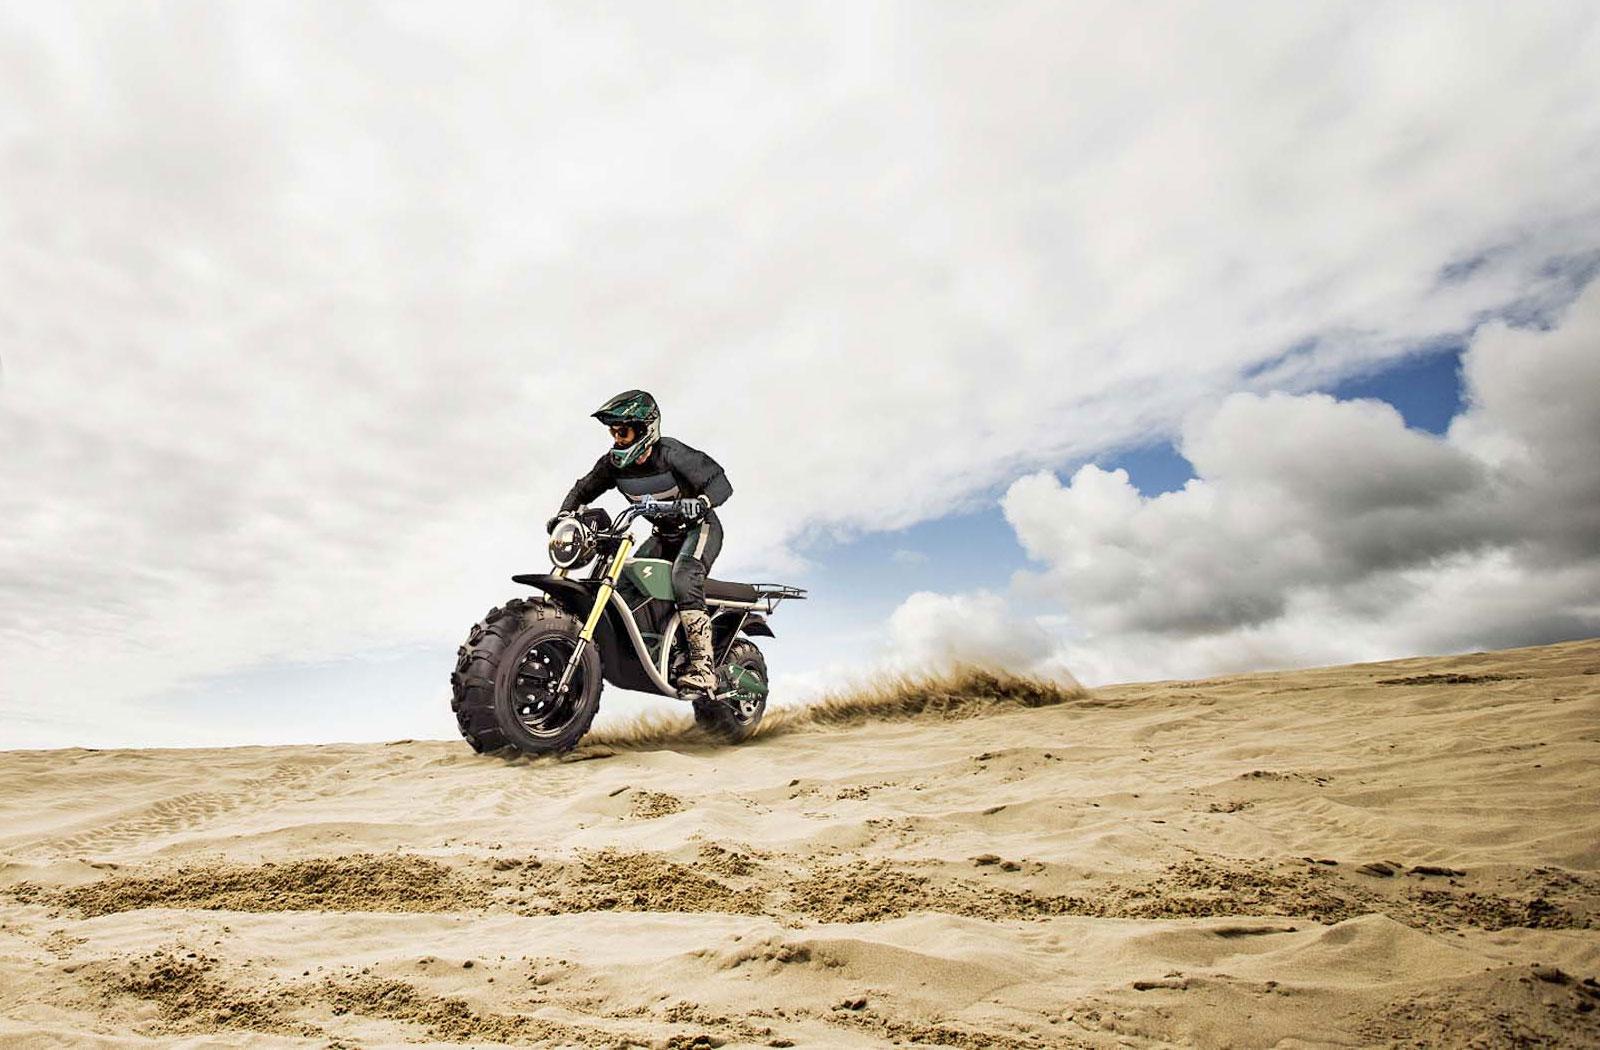 Volcon Grunt blasting across a sandy beach